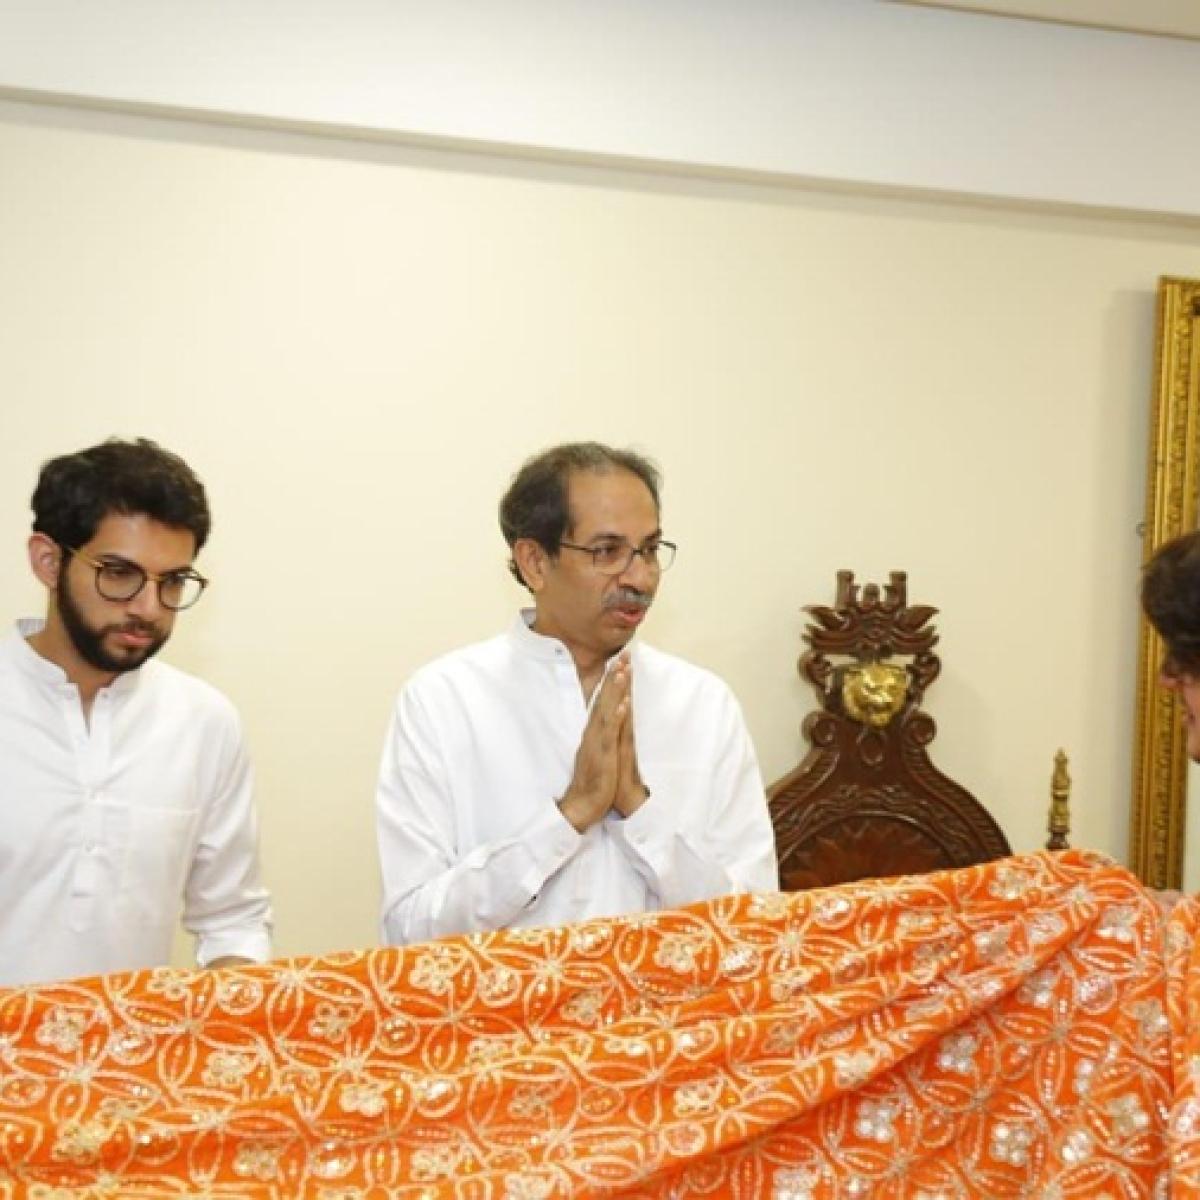 Maharashtra CM Uddhav Thackeray, son Aaditya send a saffron chadar to be offered at Ajmer dargah